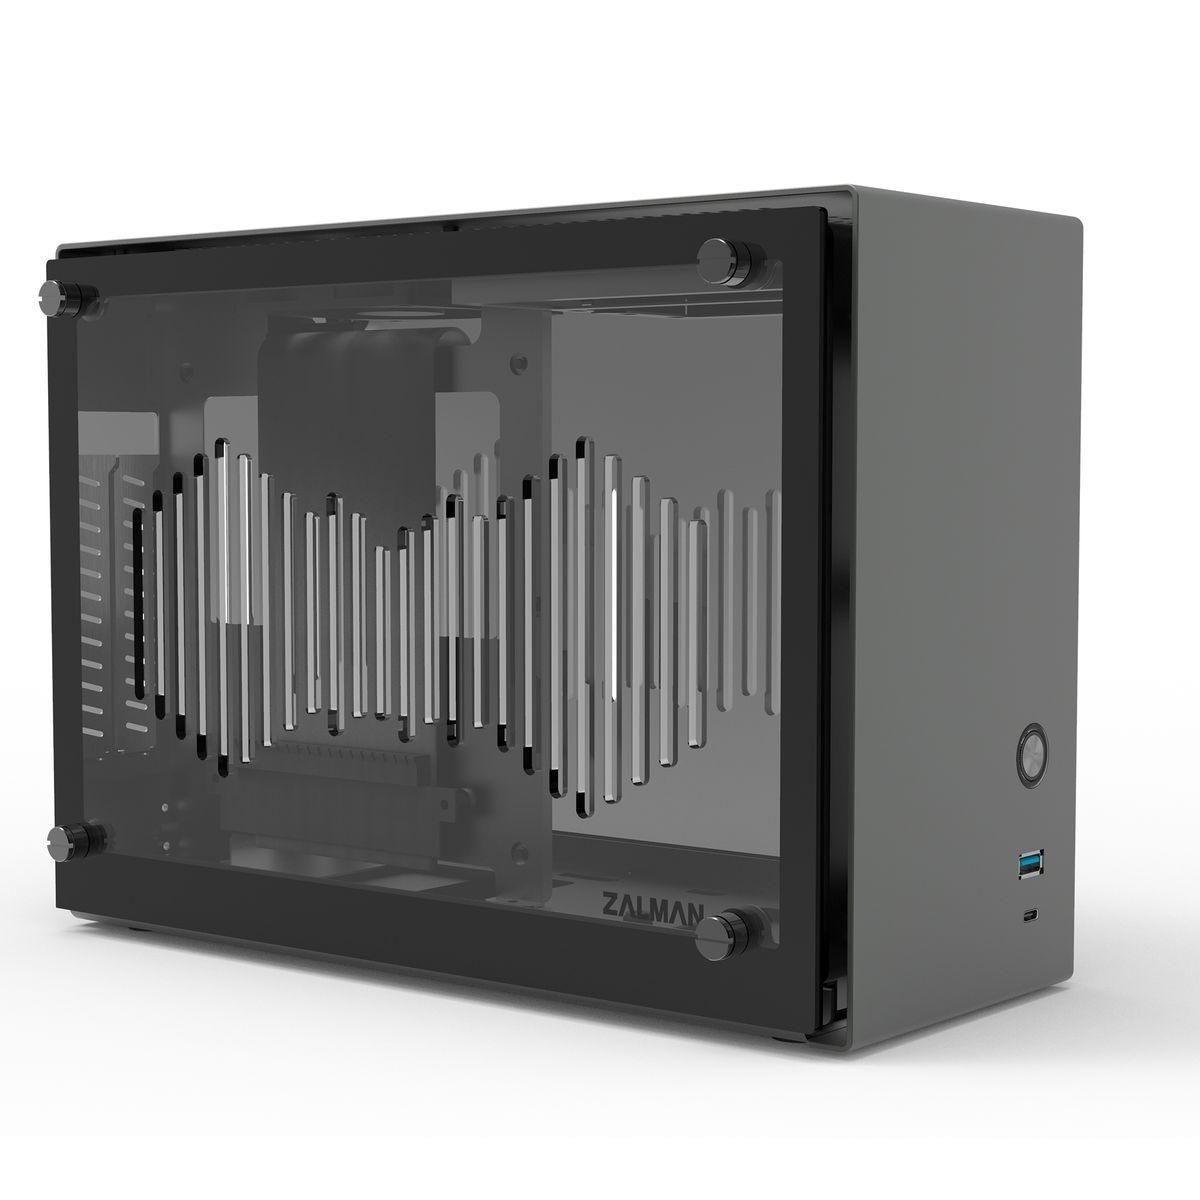 ZALMAN PCケース M2 Mini(Gray) M2-Mini(Gray)